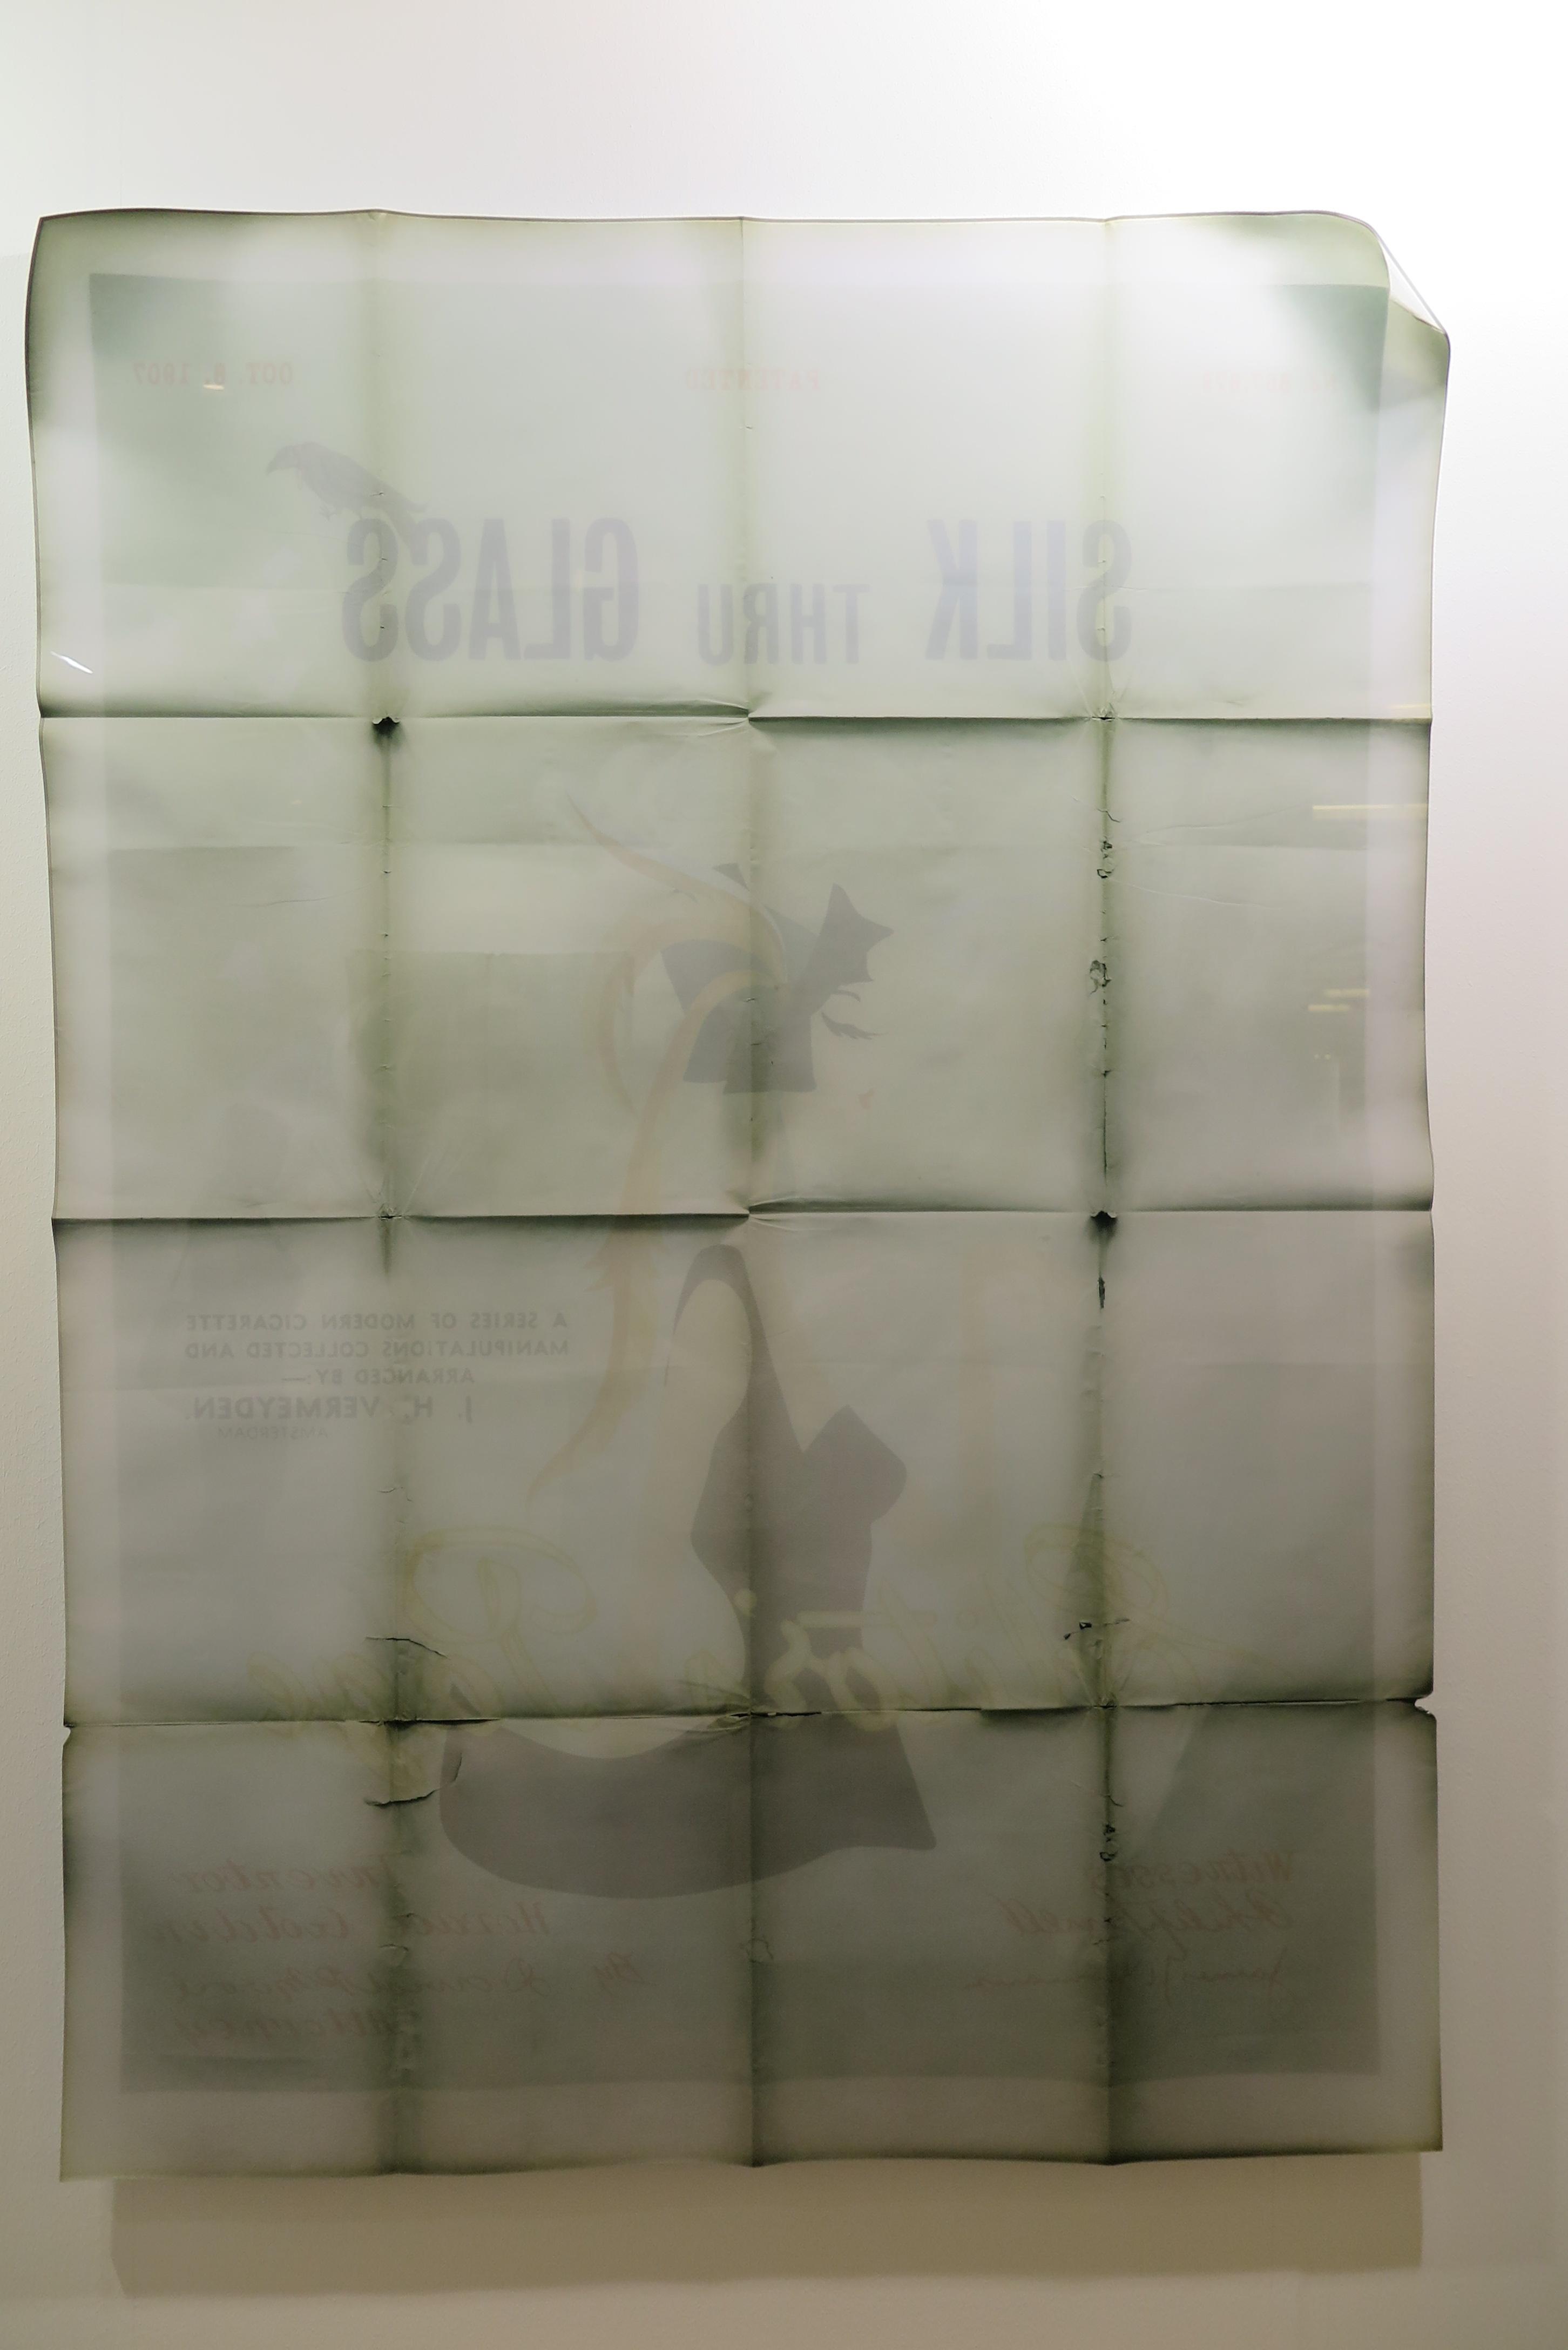 Lars Morell - untitled - ink on paper, shapcut diasec - 2015